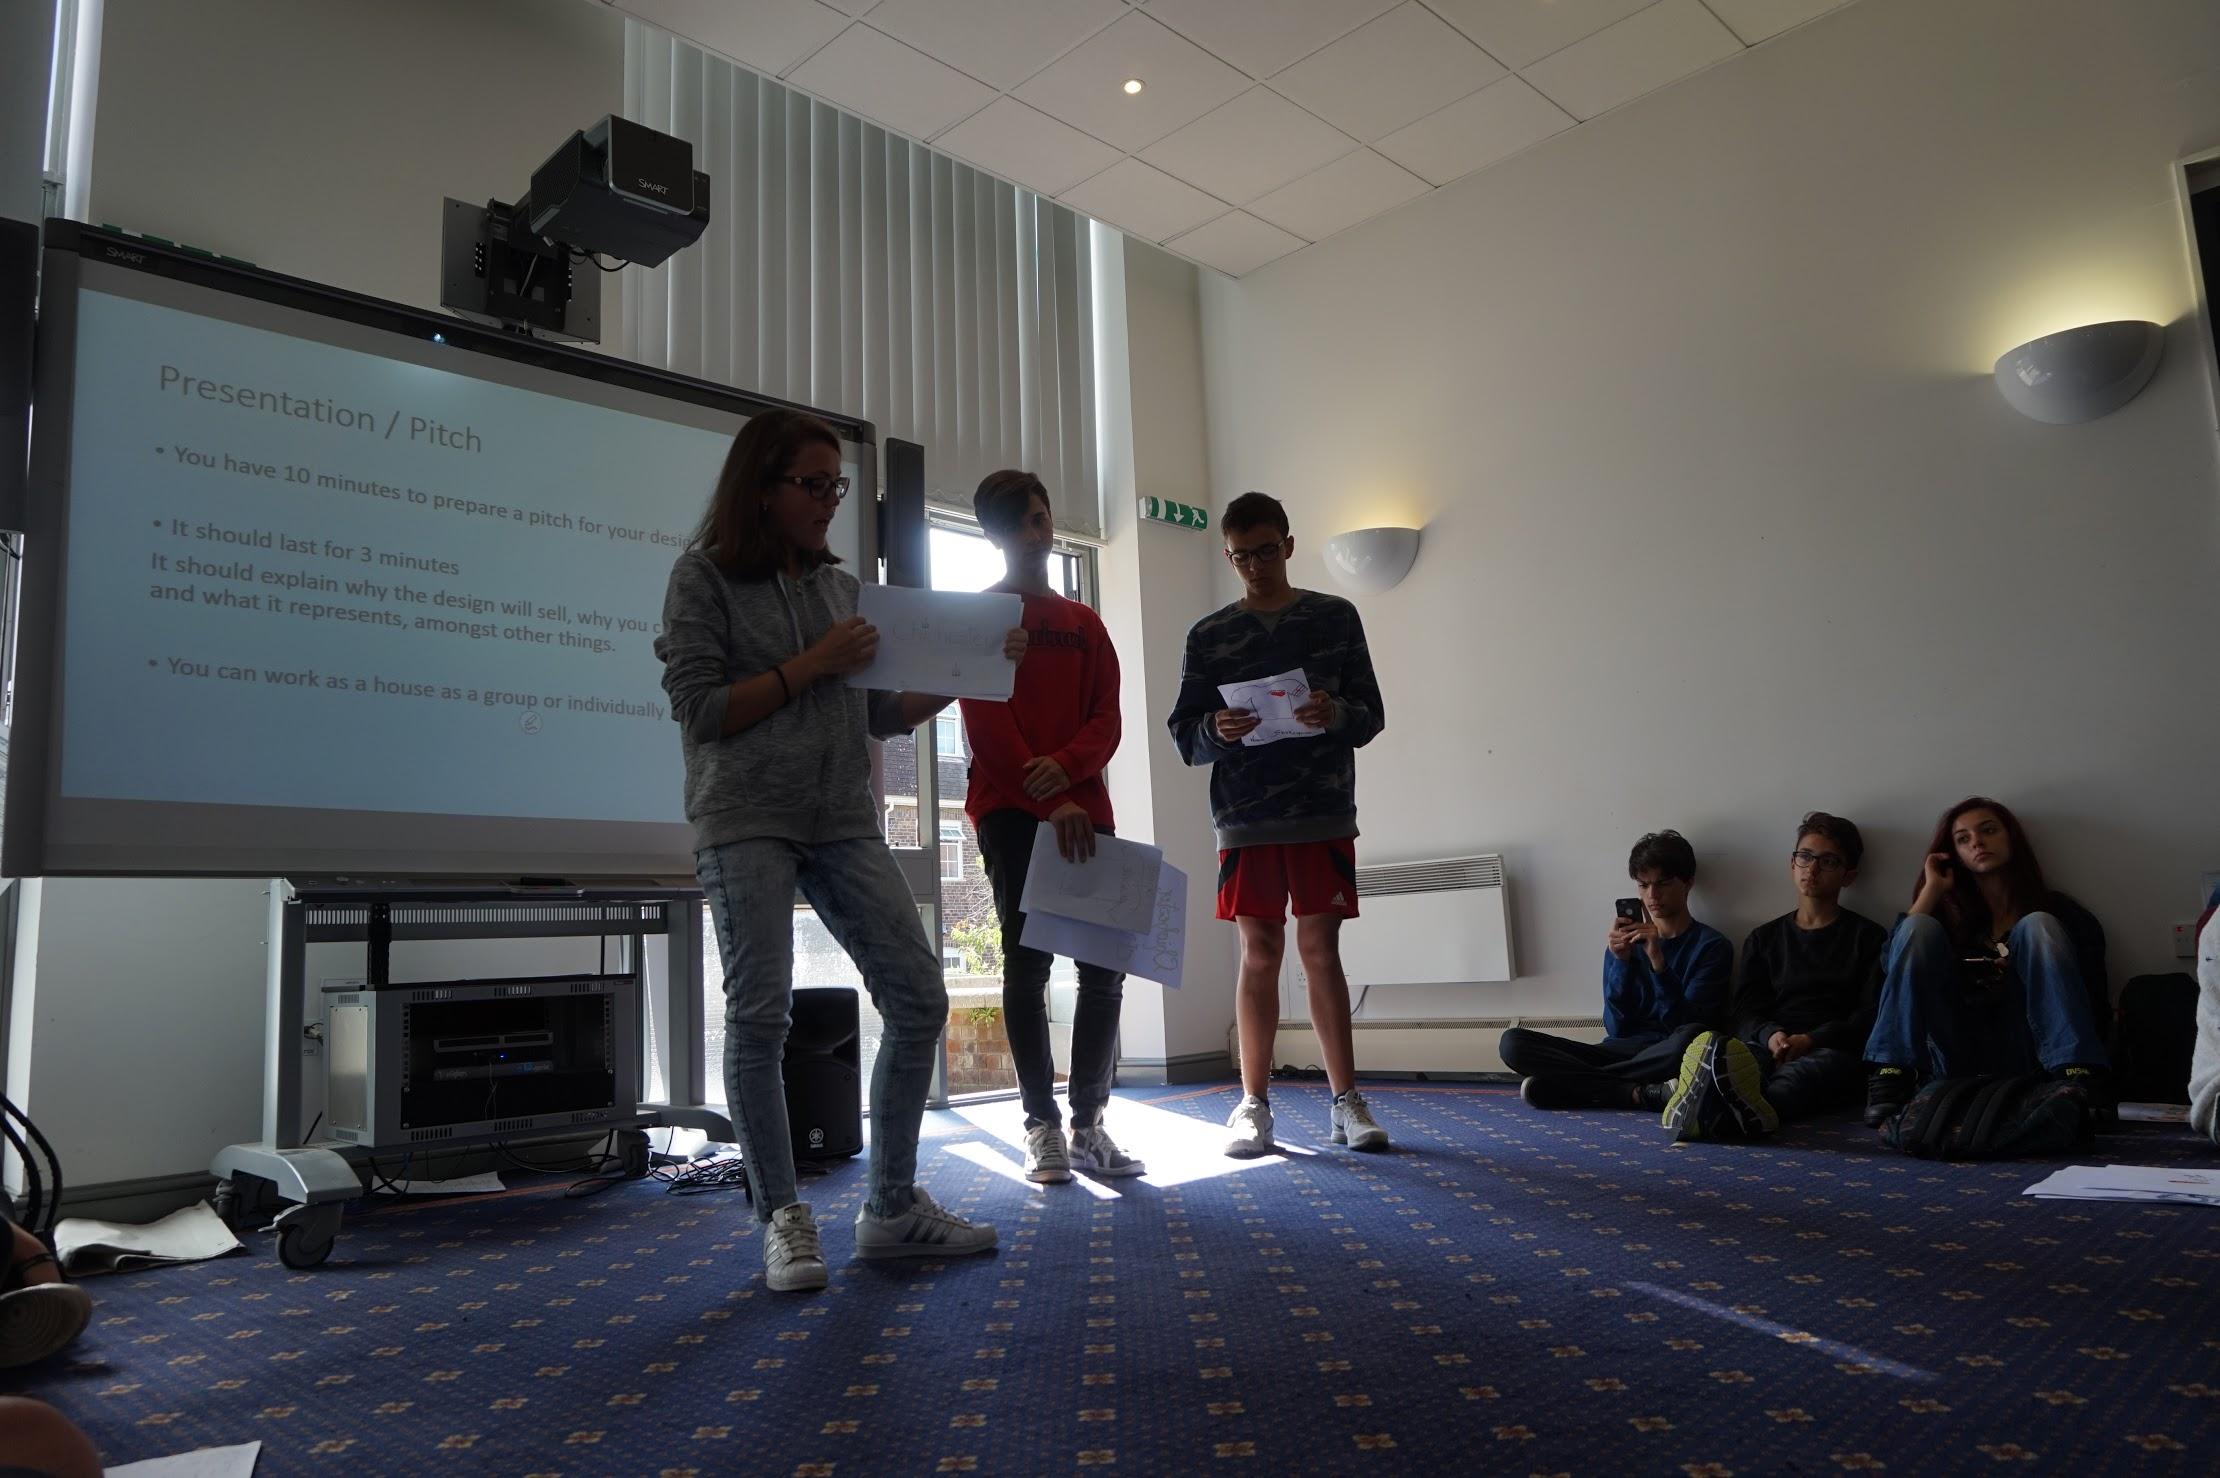 presentation pitch